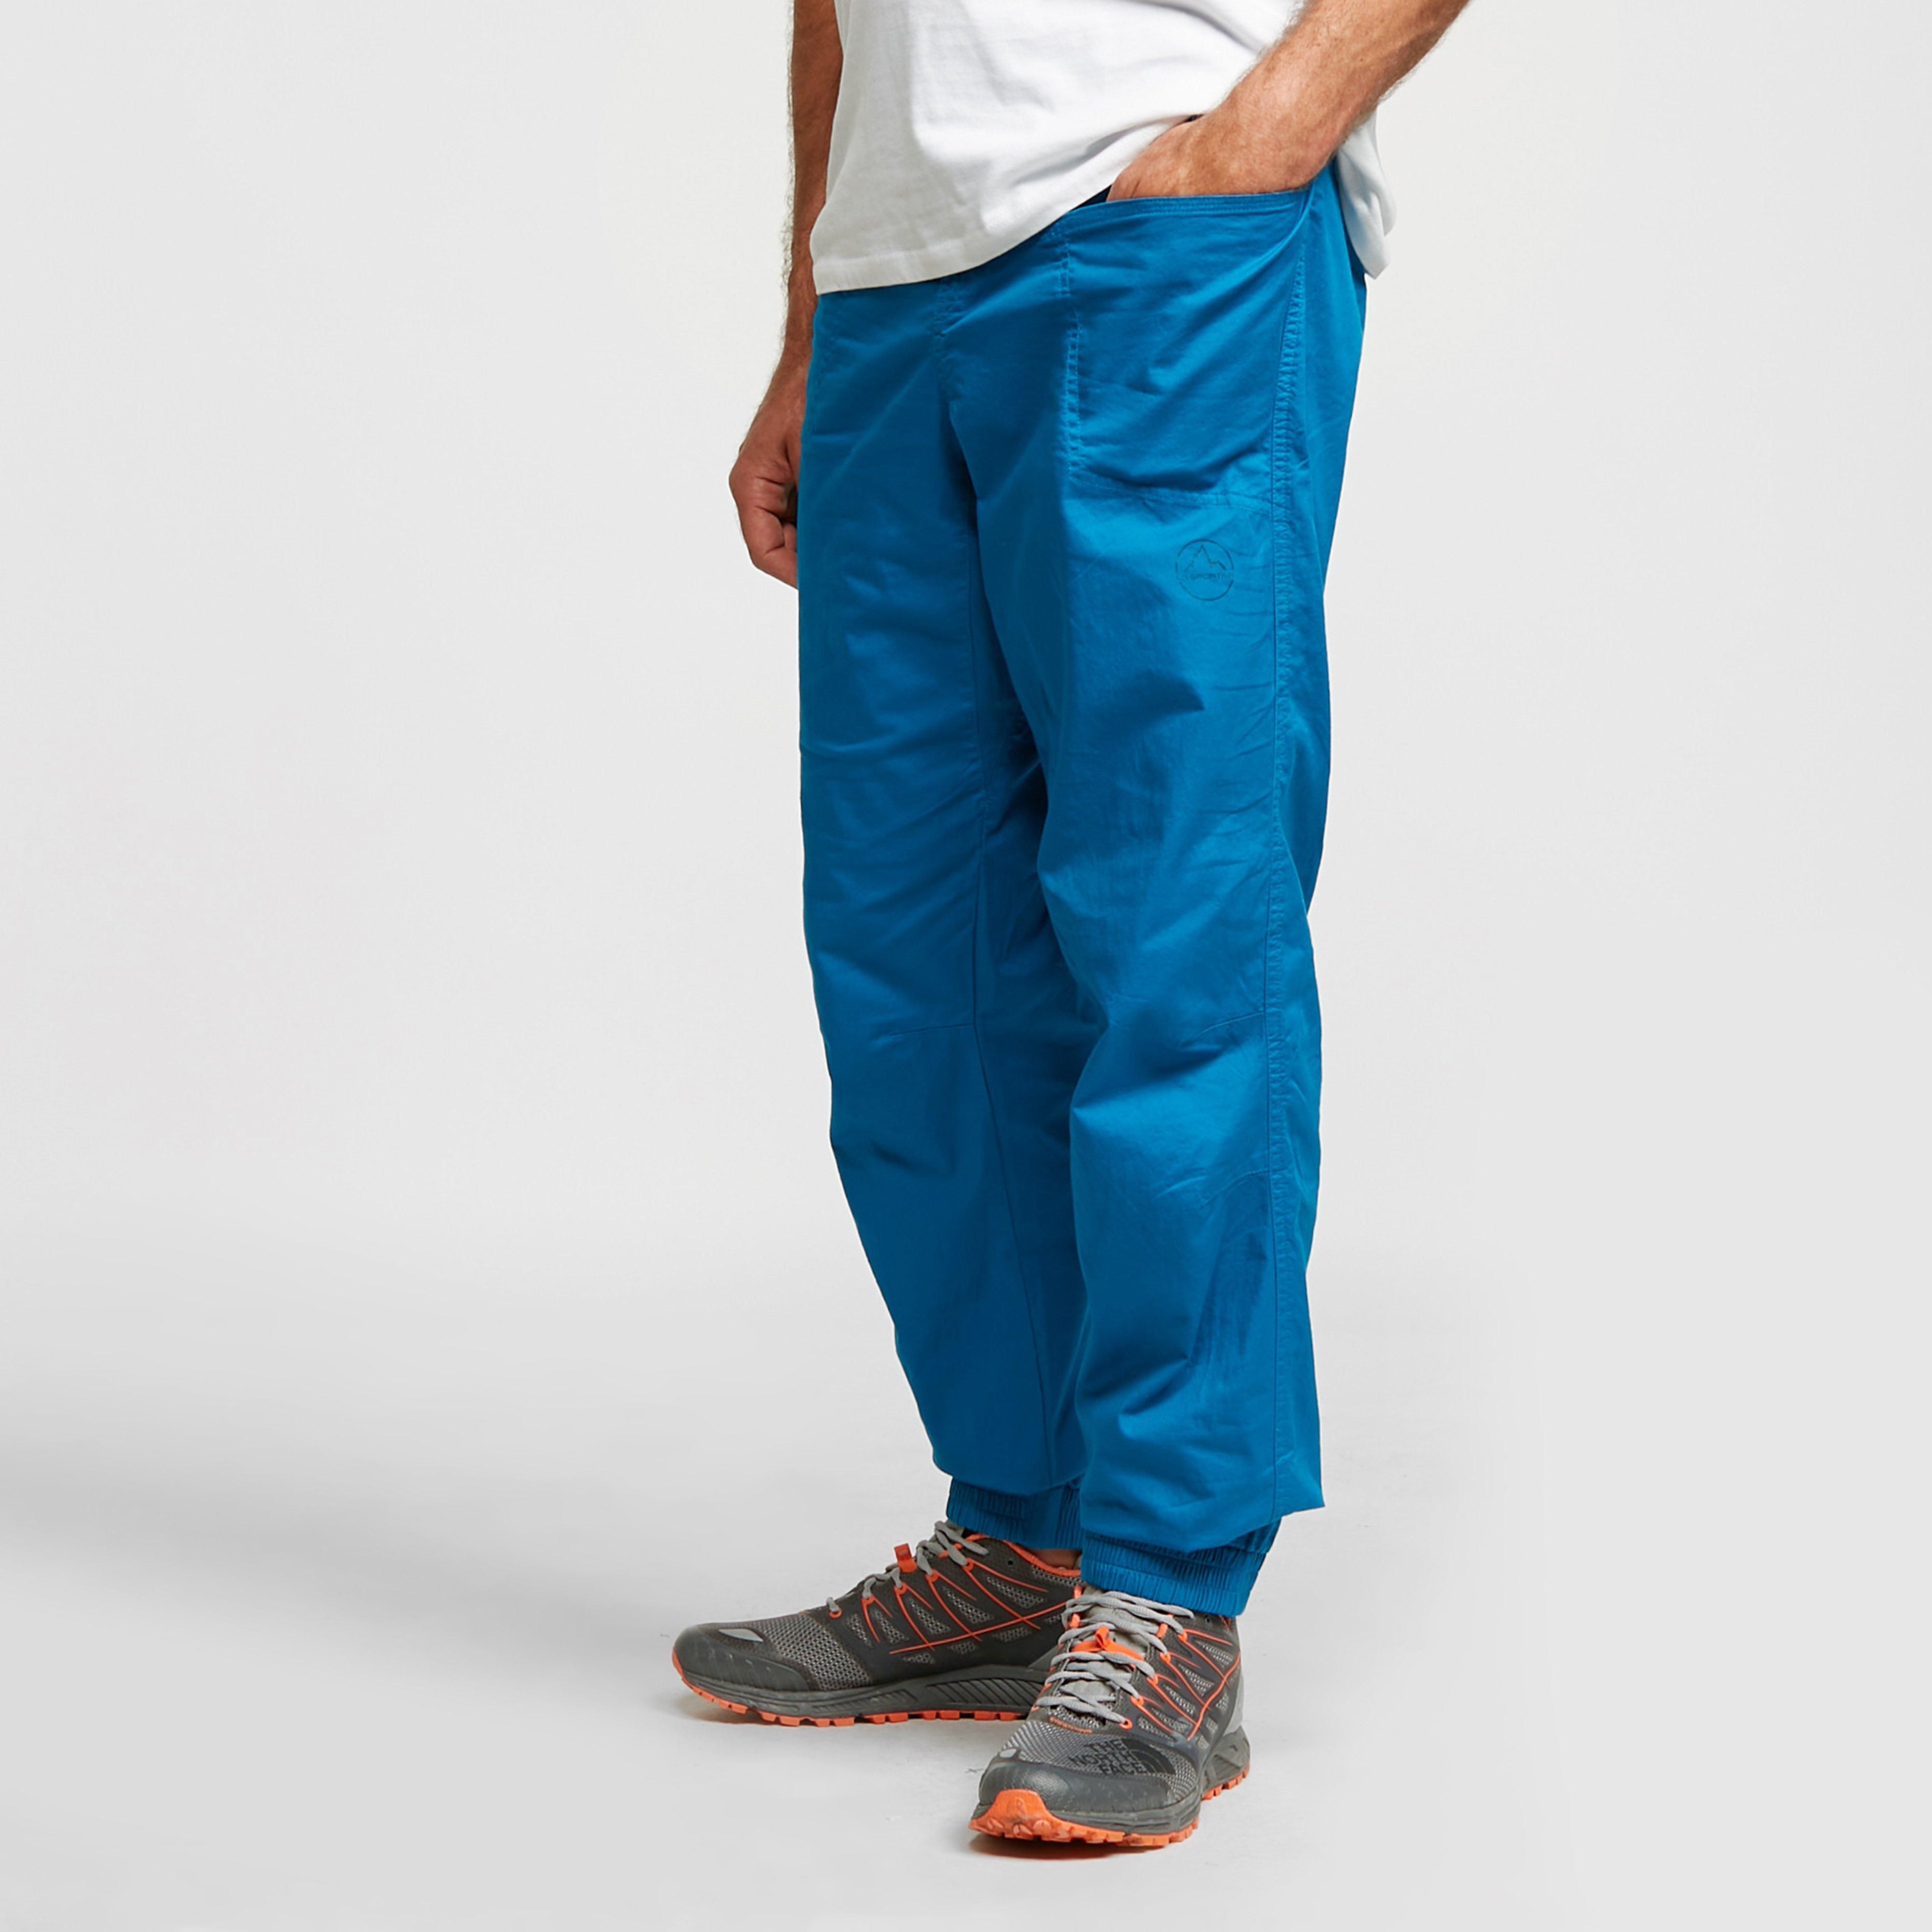 La Sportiva Men's Sandstone Pants - Blue/Bbl, Blue